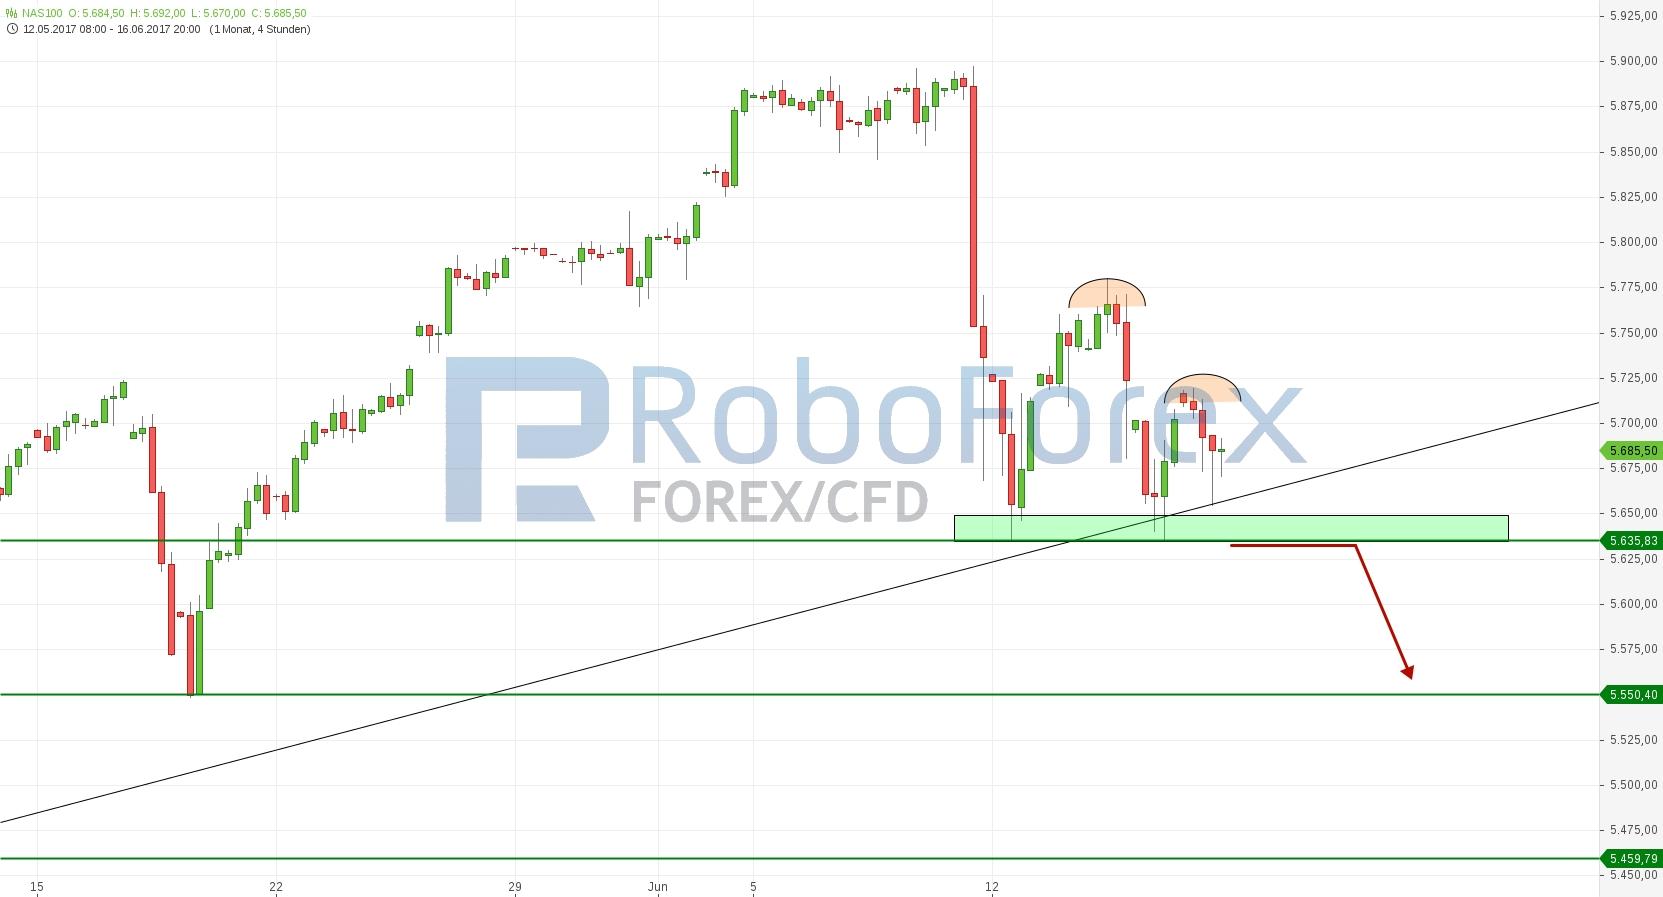 chart-17062017-1254-nas-roboforex.jpg